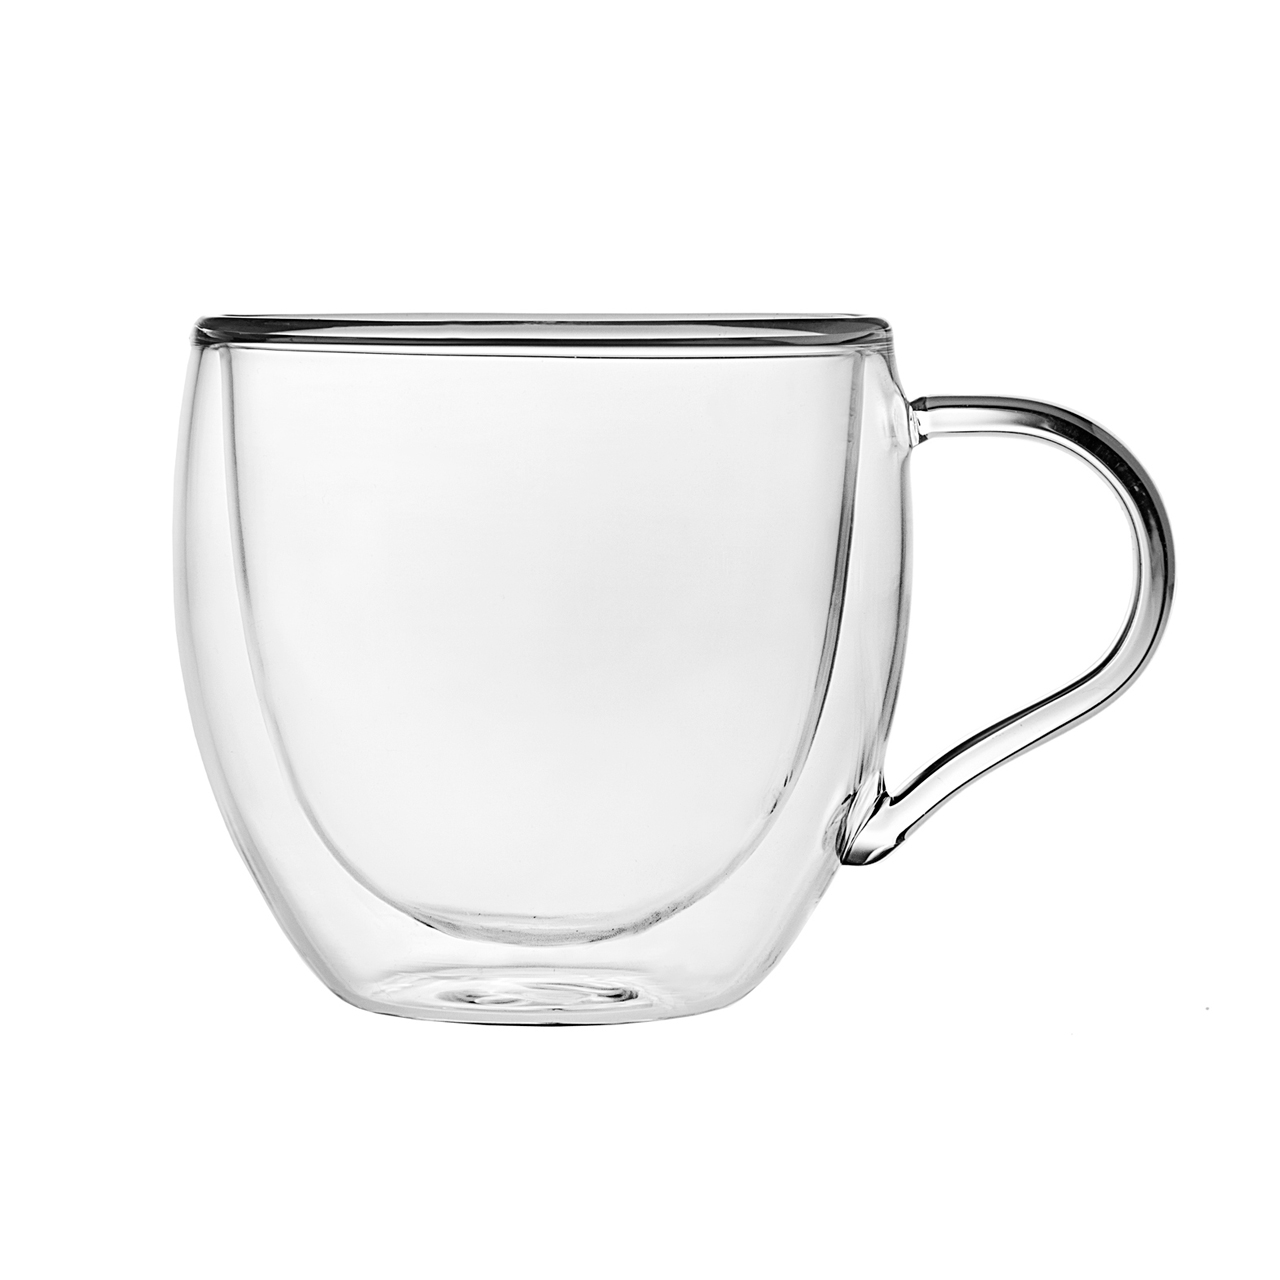 1280x1280 Artisan Espresso Cups Bowring